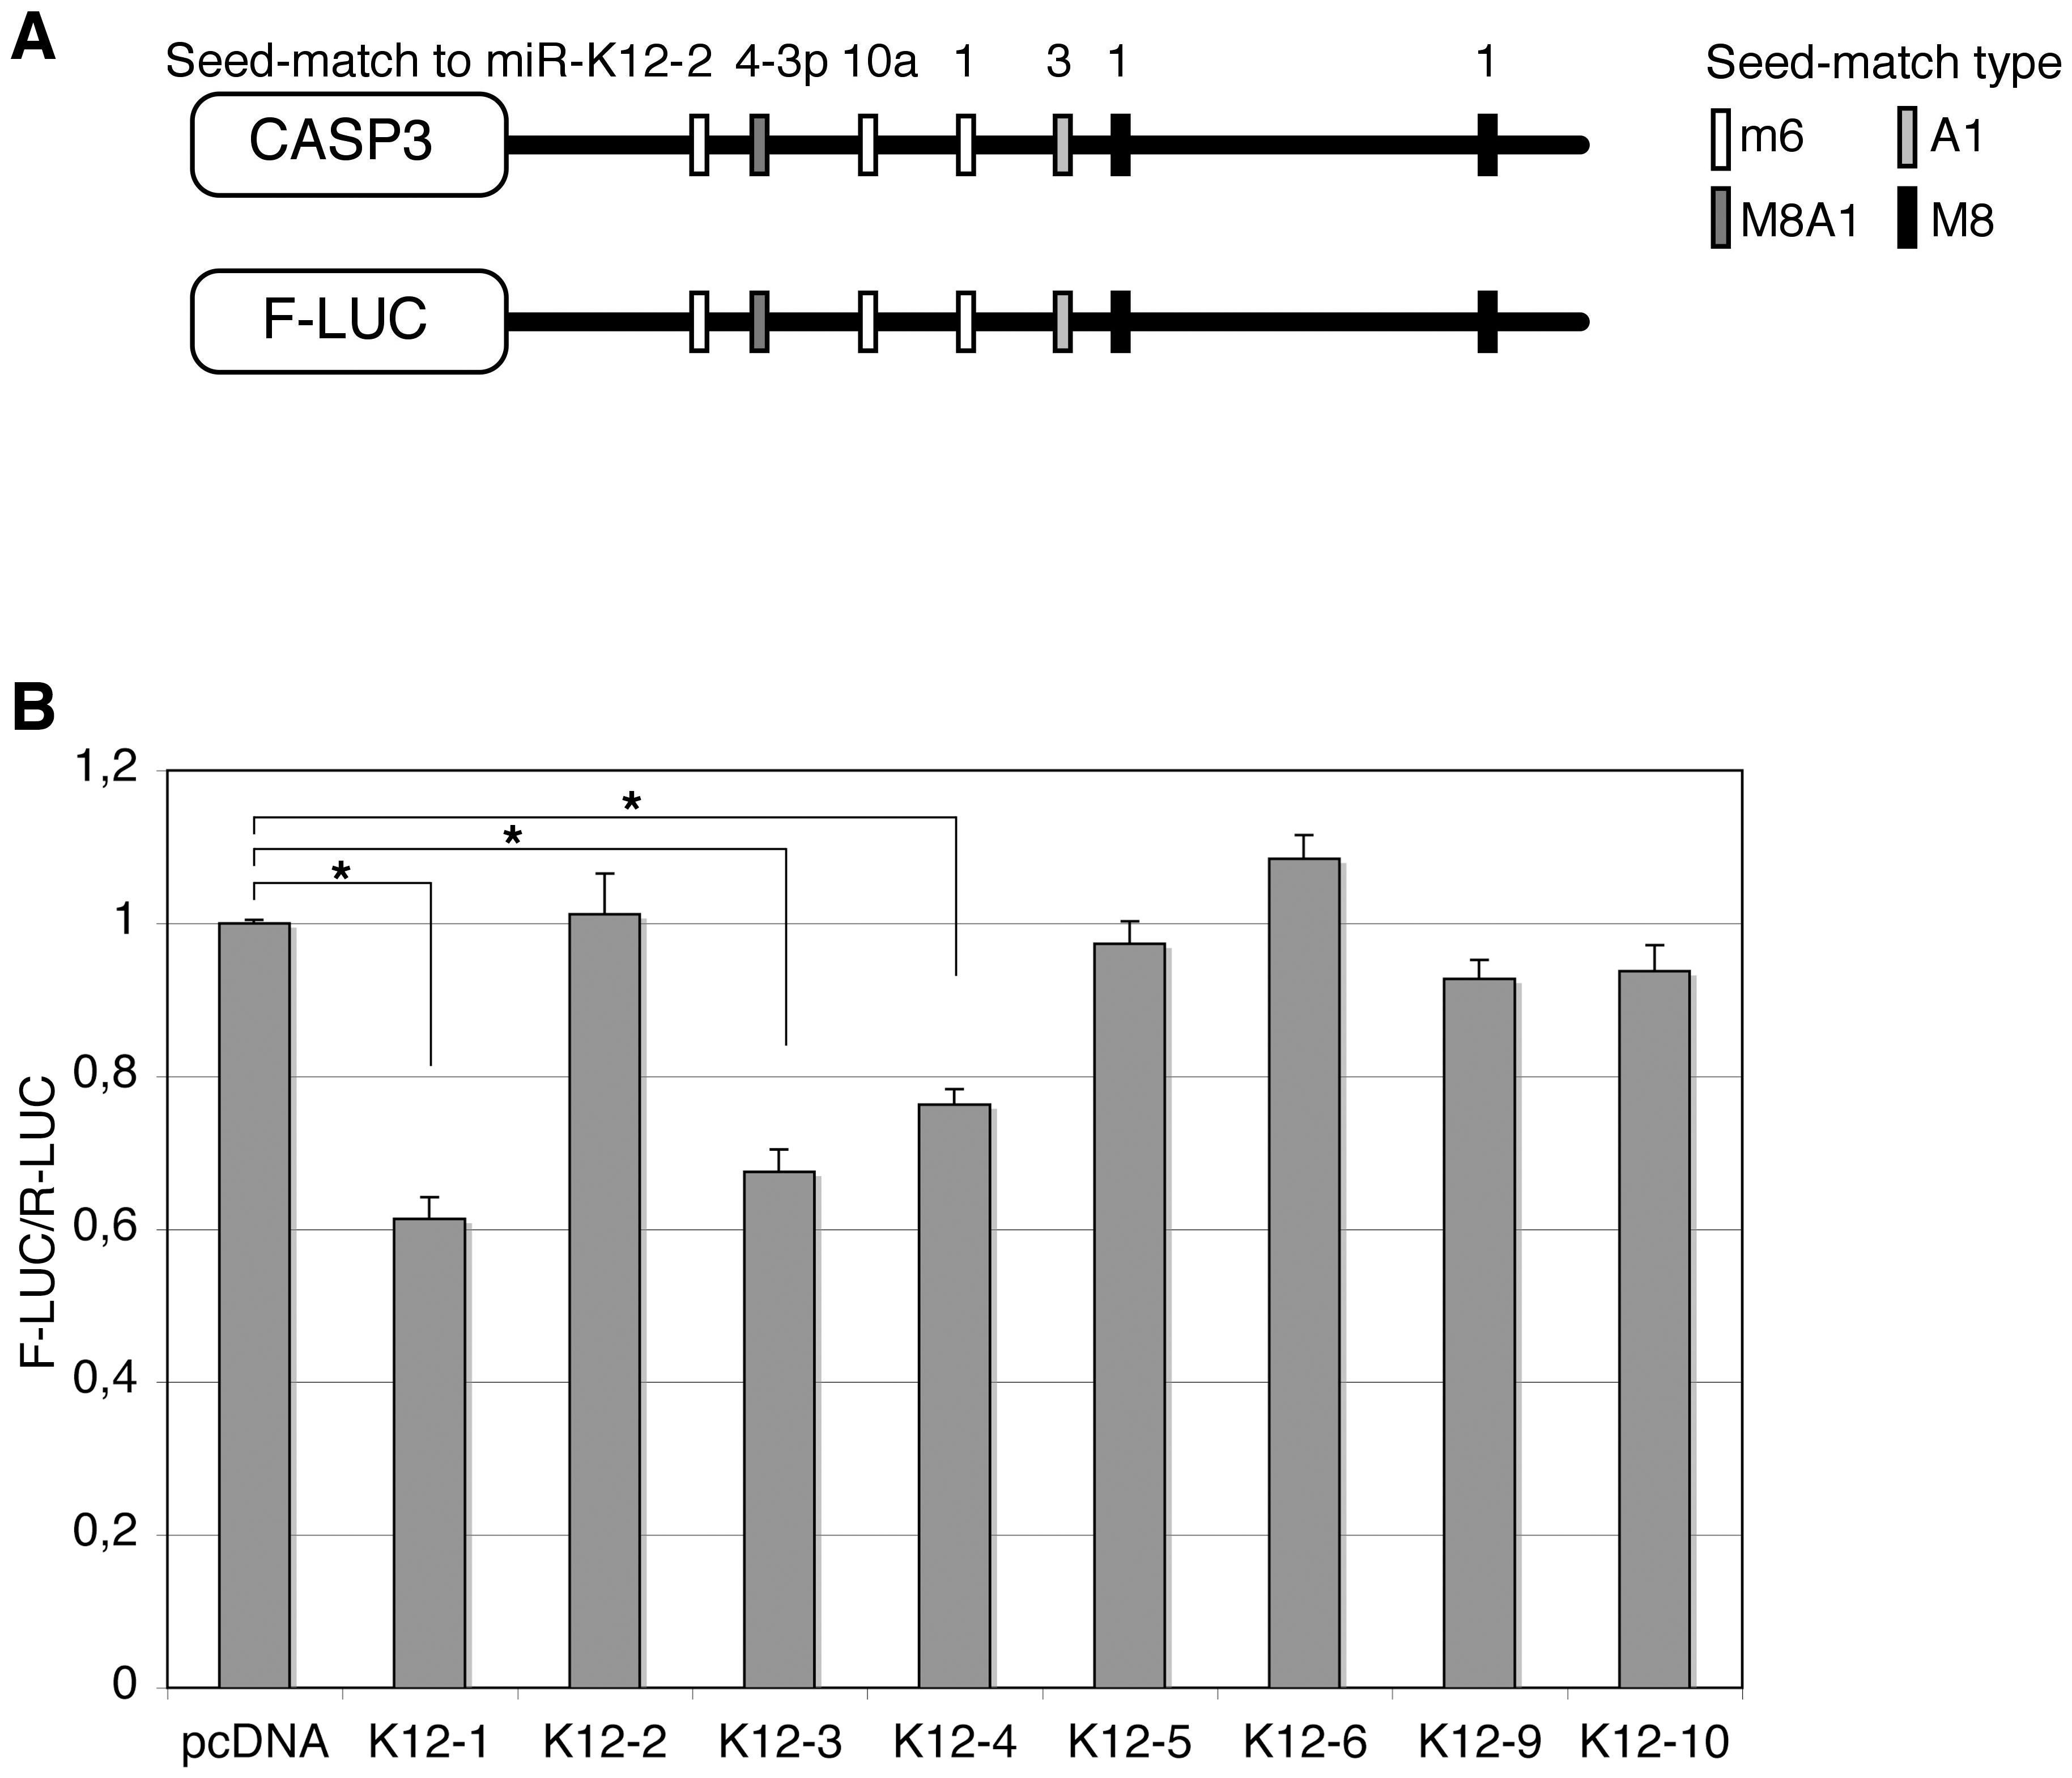 Caspase 3 is targeted by several KSHV miRNAs.